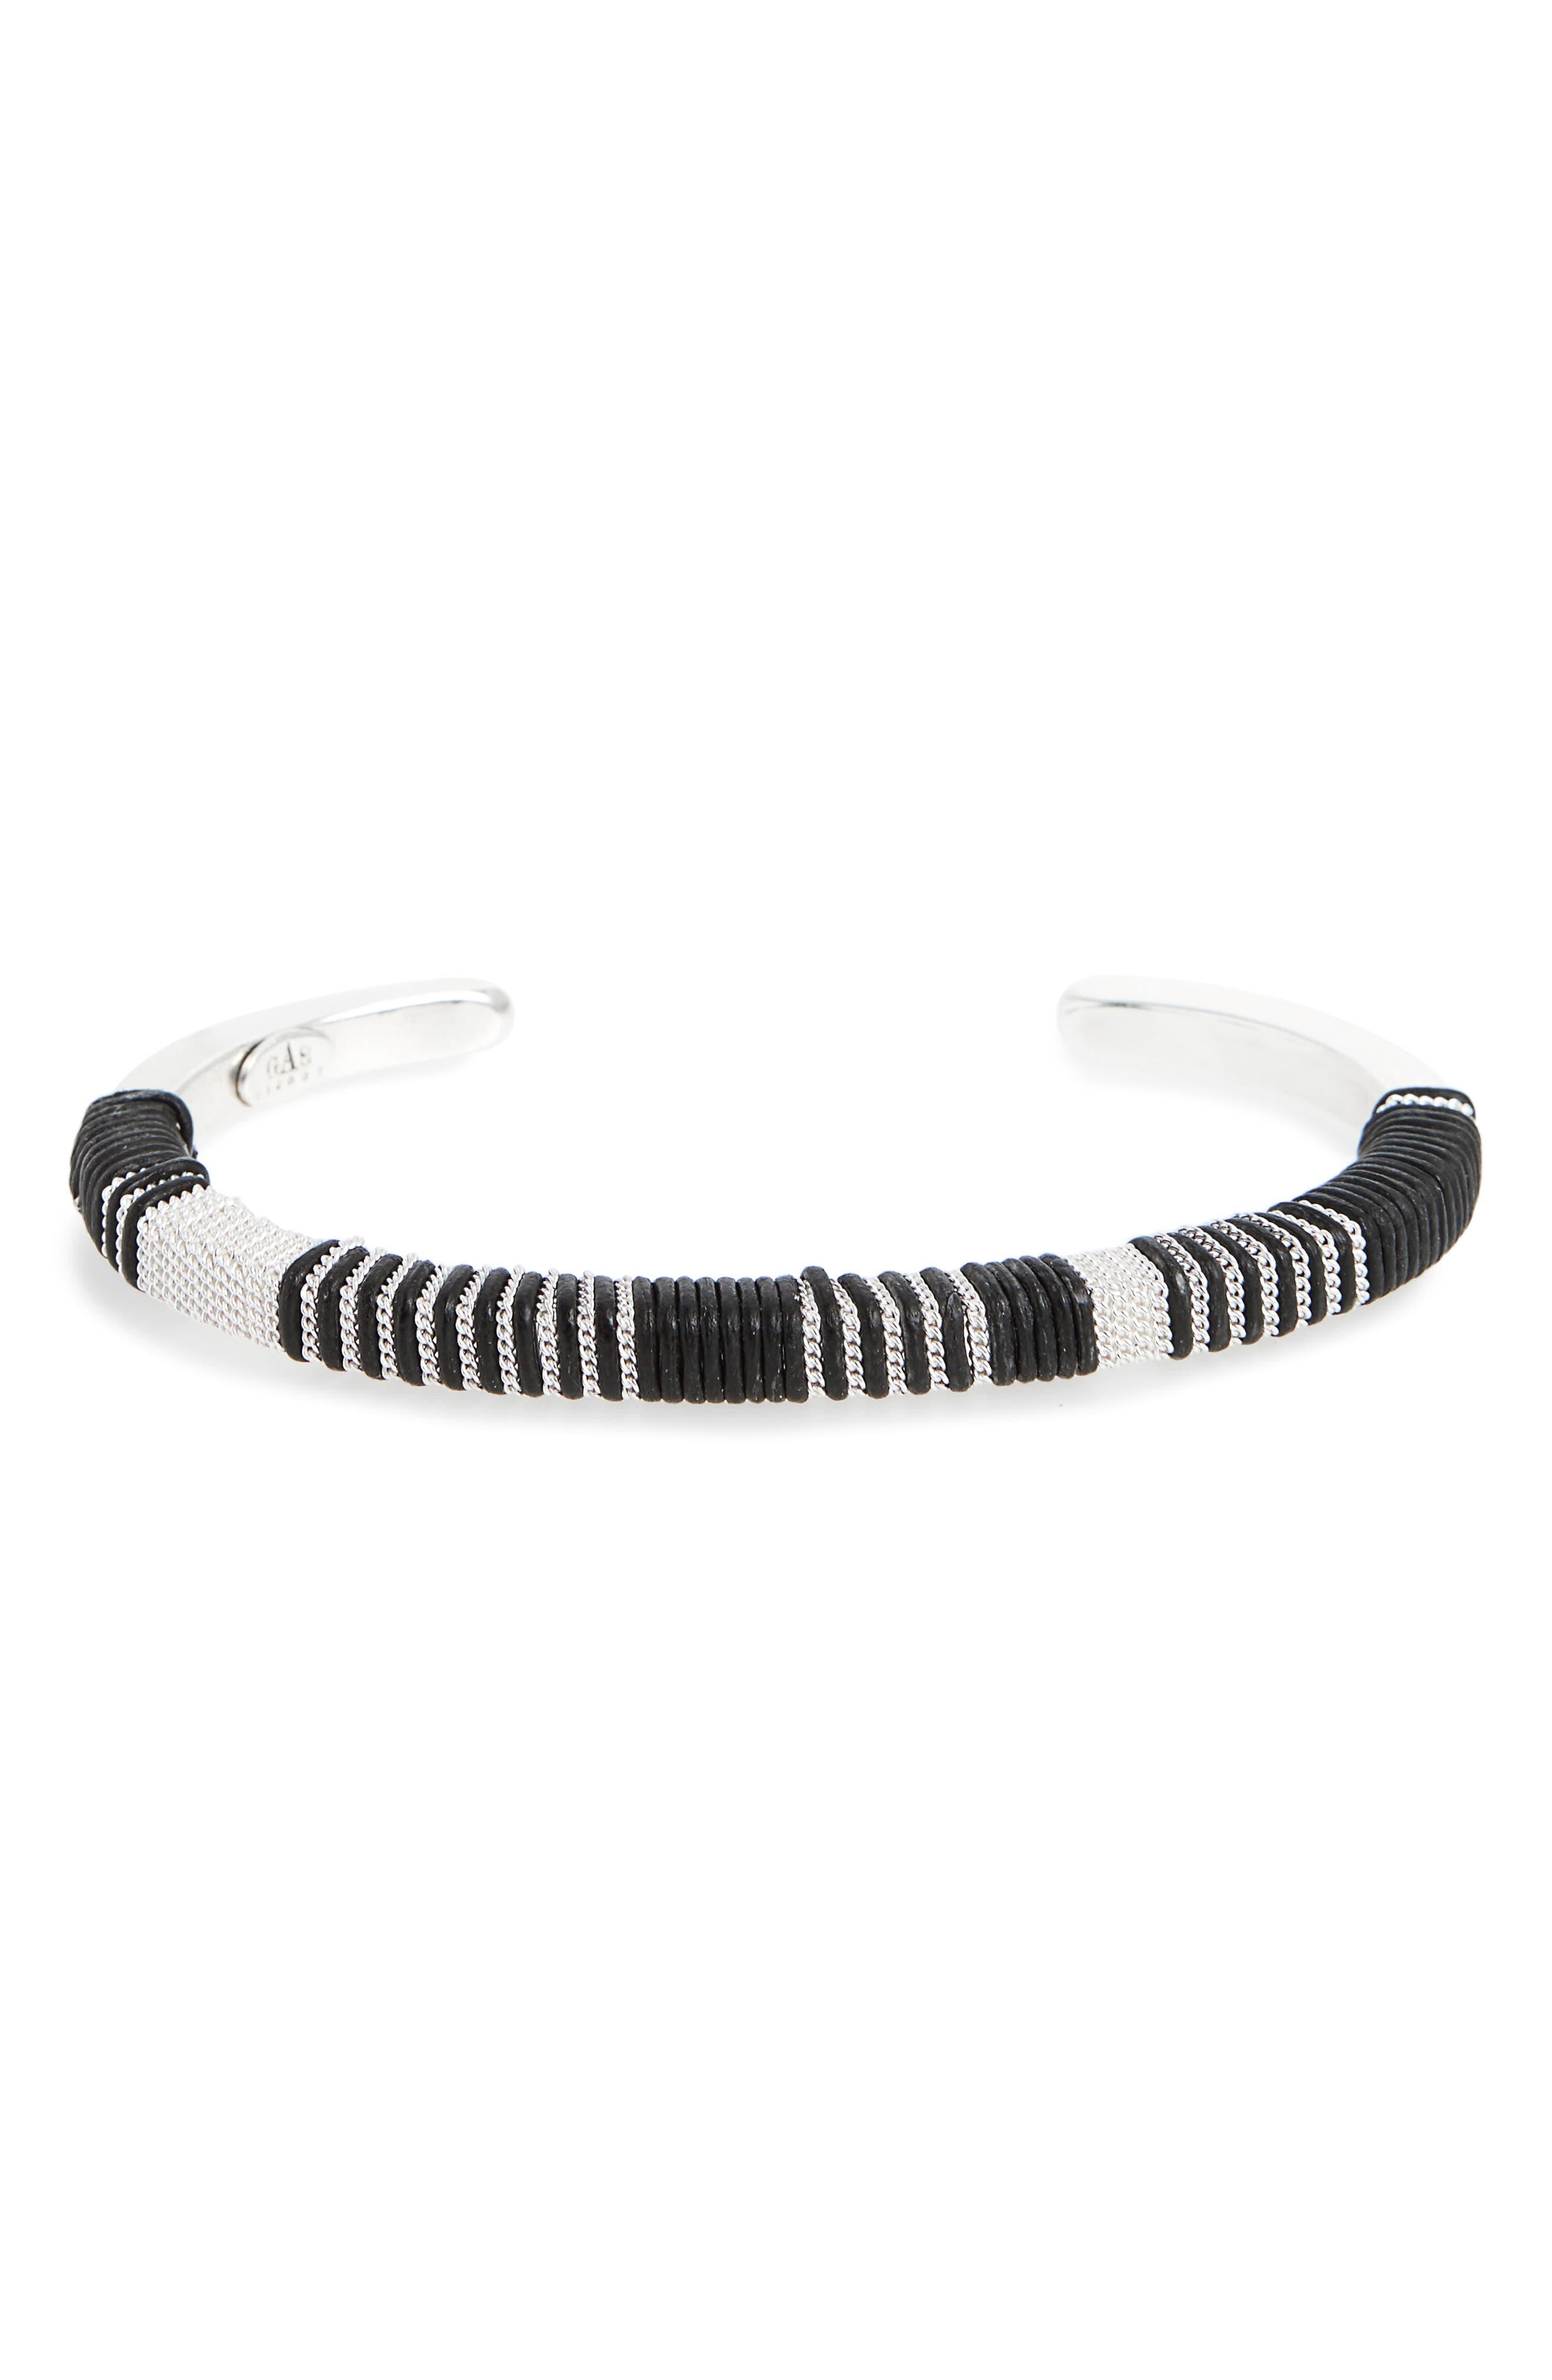 Tomboy Cuff Bracelet,                         Main,                         color, 001